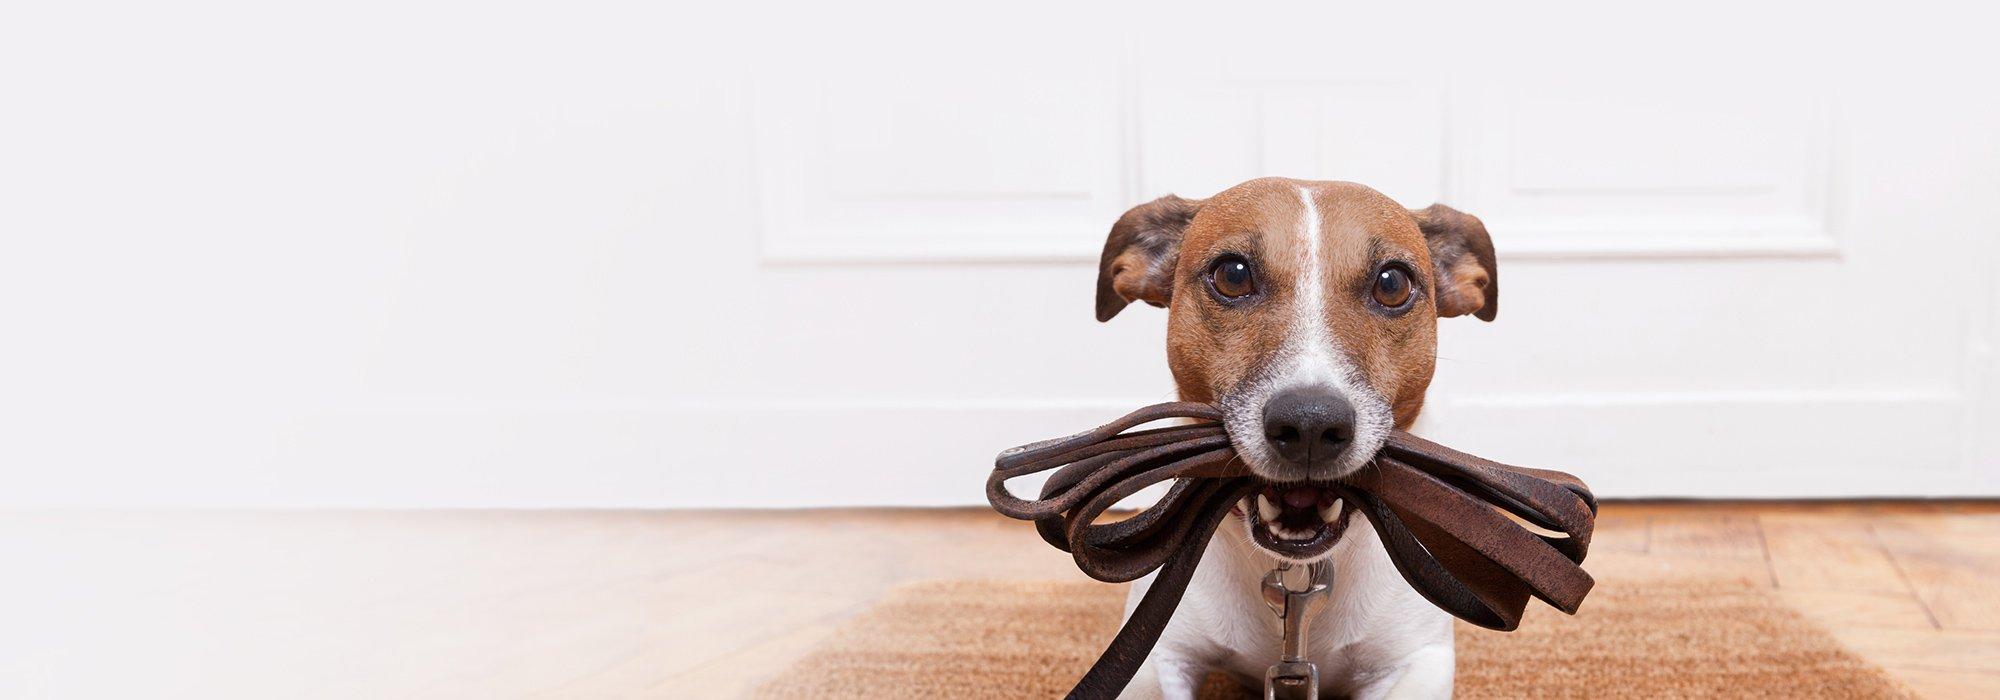 Eglinton dog walker toronto dog walking service for Puppy dog walker